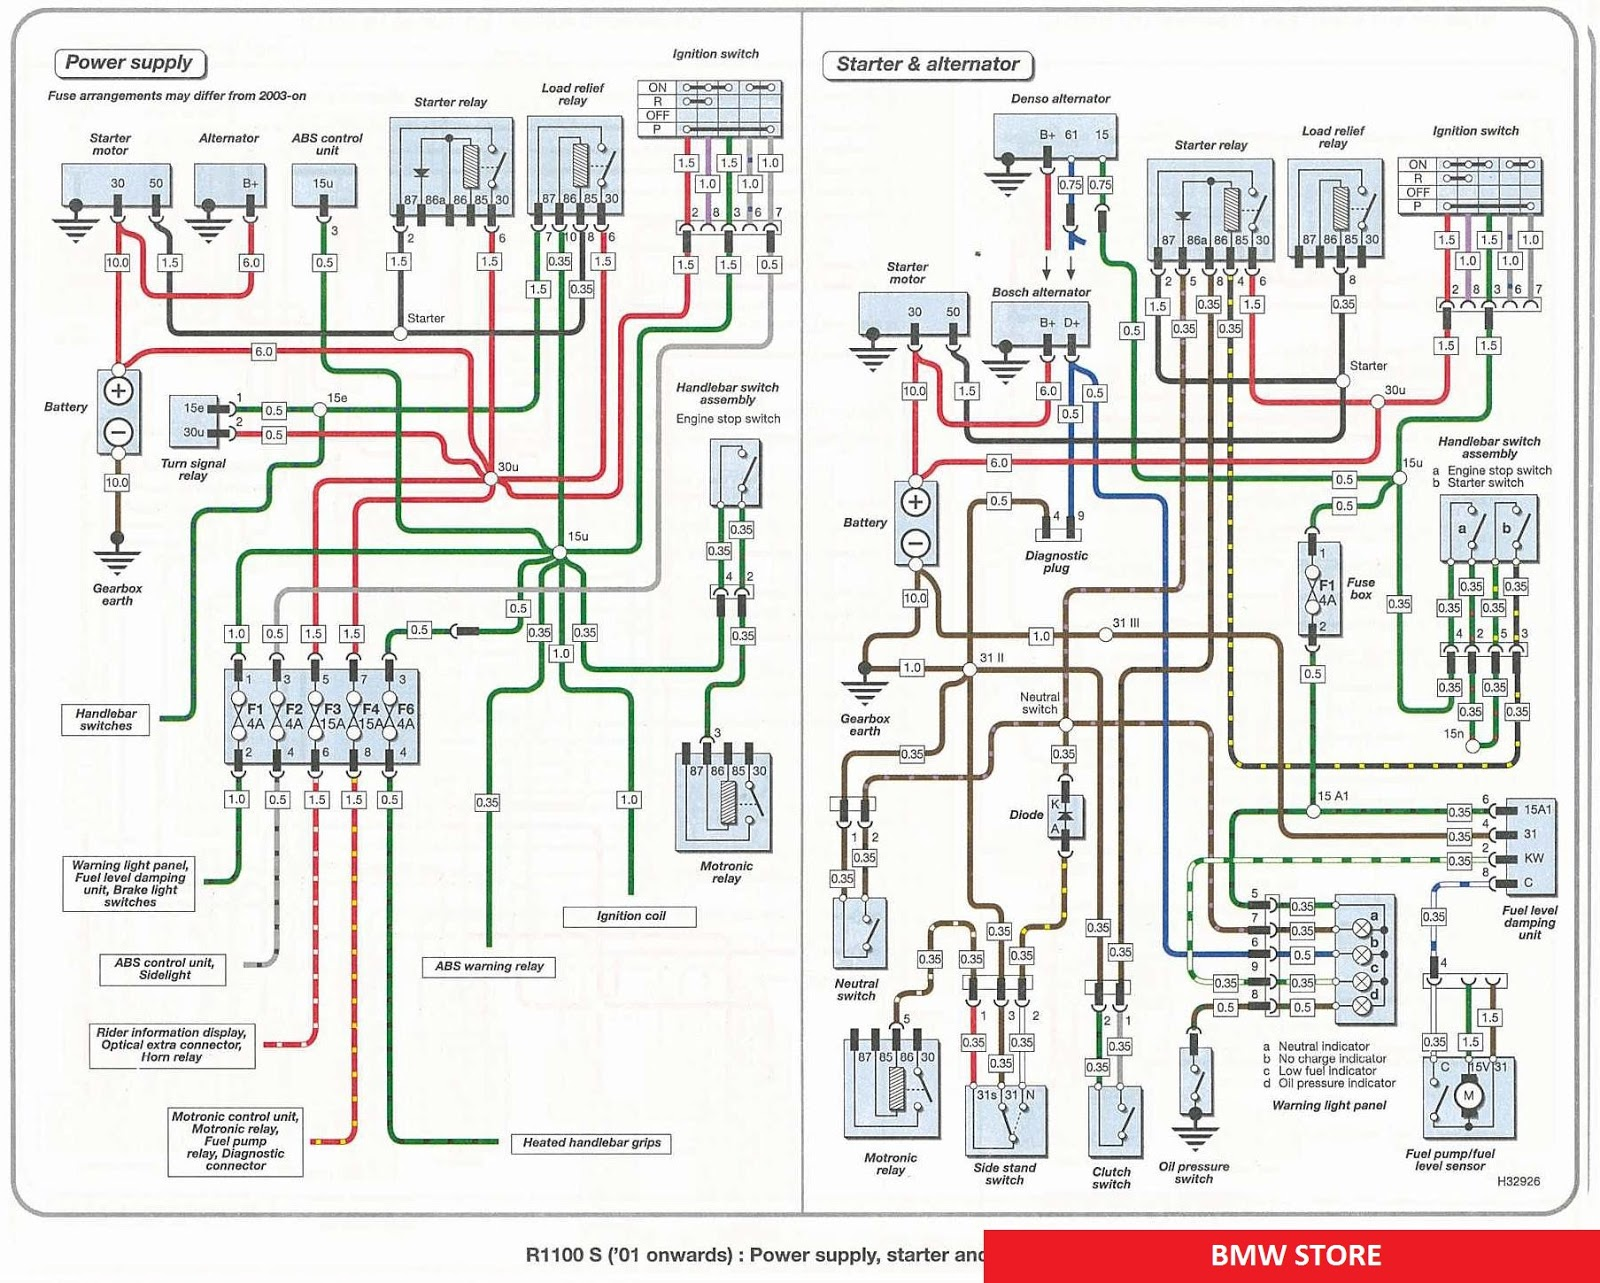 small resolution of bmw r1150r wiring diagram home wiring diagram bmw r1150r wiring diagram